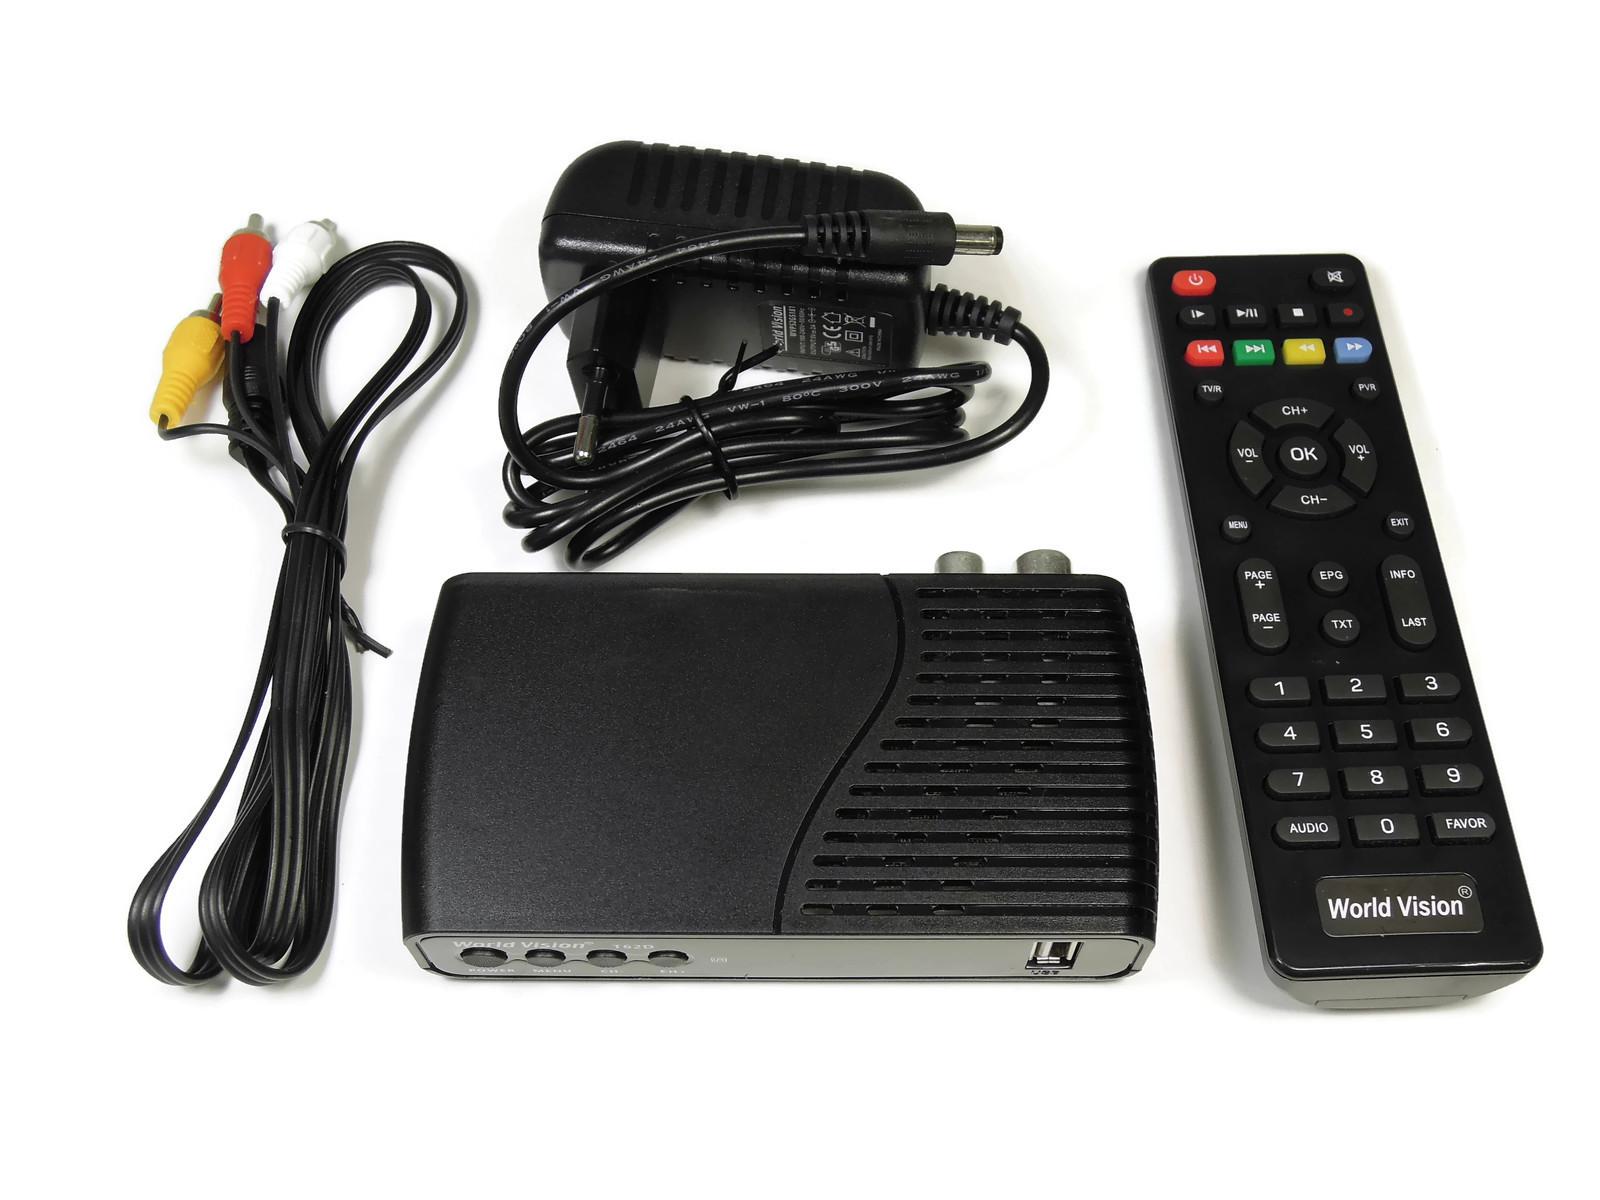 ТВ-приставка цифровая World Vision T62D (DVB-T2)